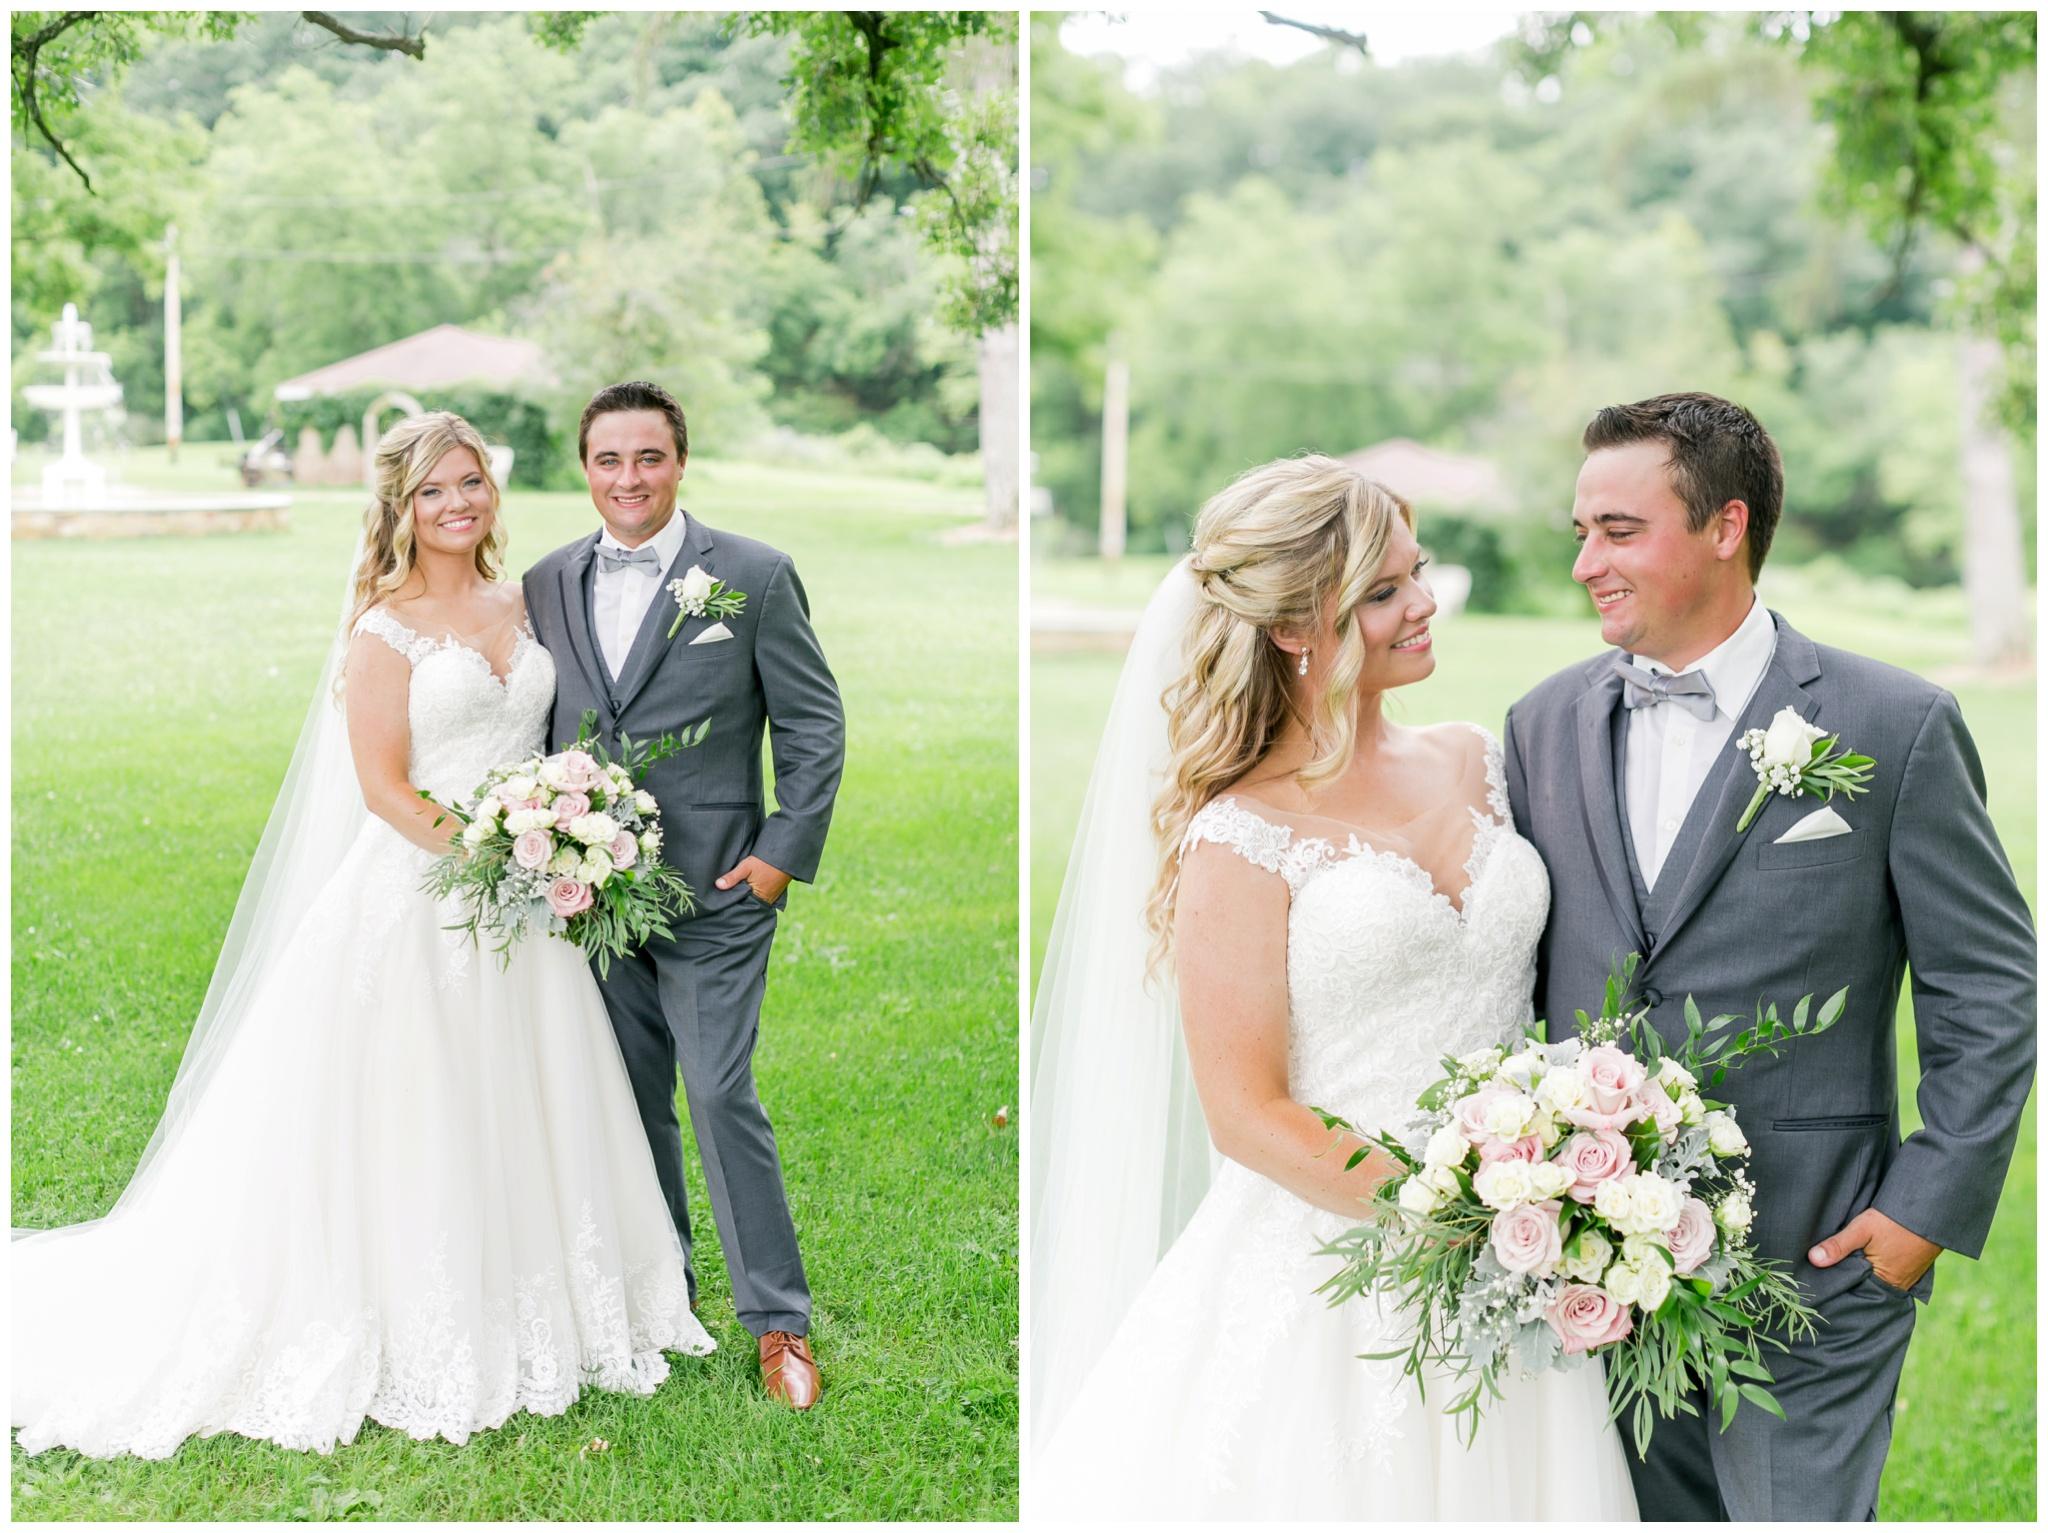 Sugarland_barn_arena_wisconsin_wedding_madison_wisconsin_4244.jpg